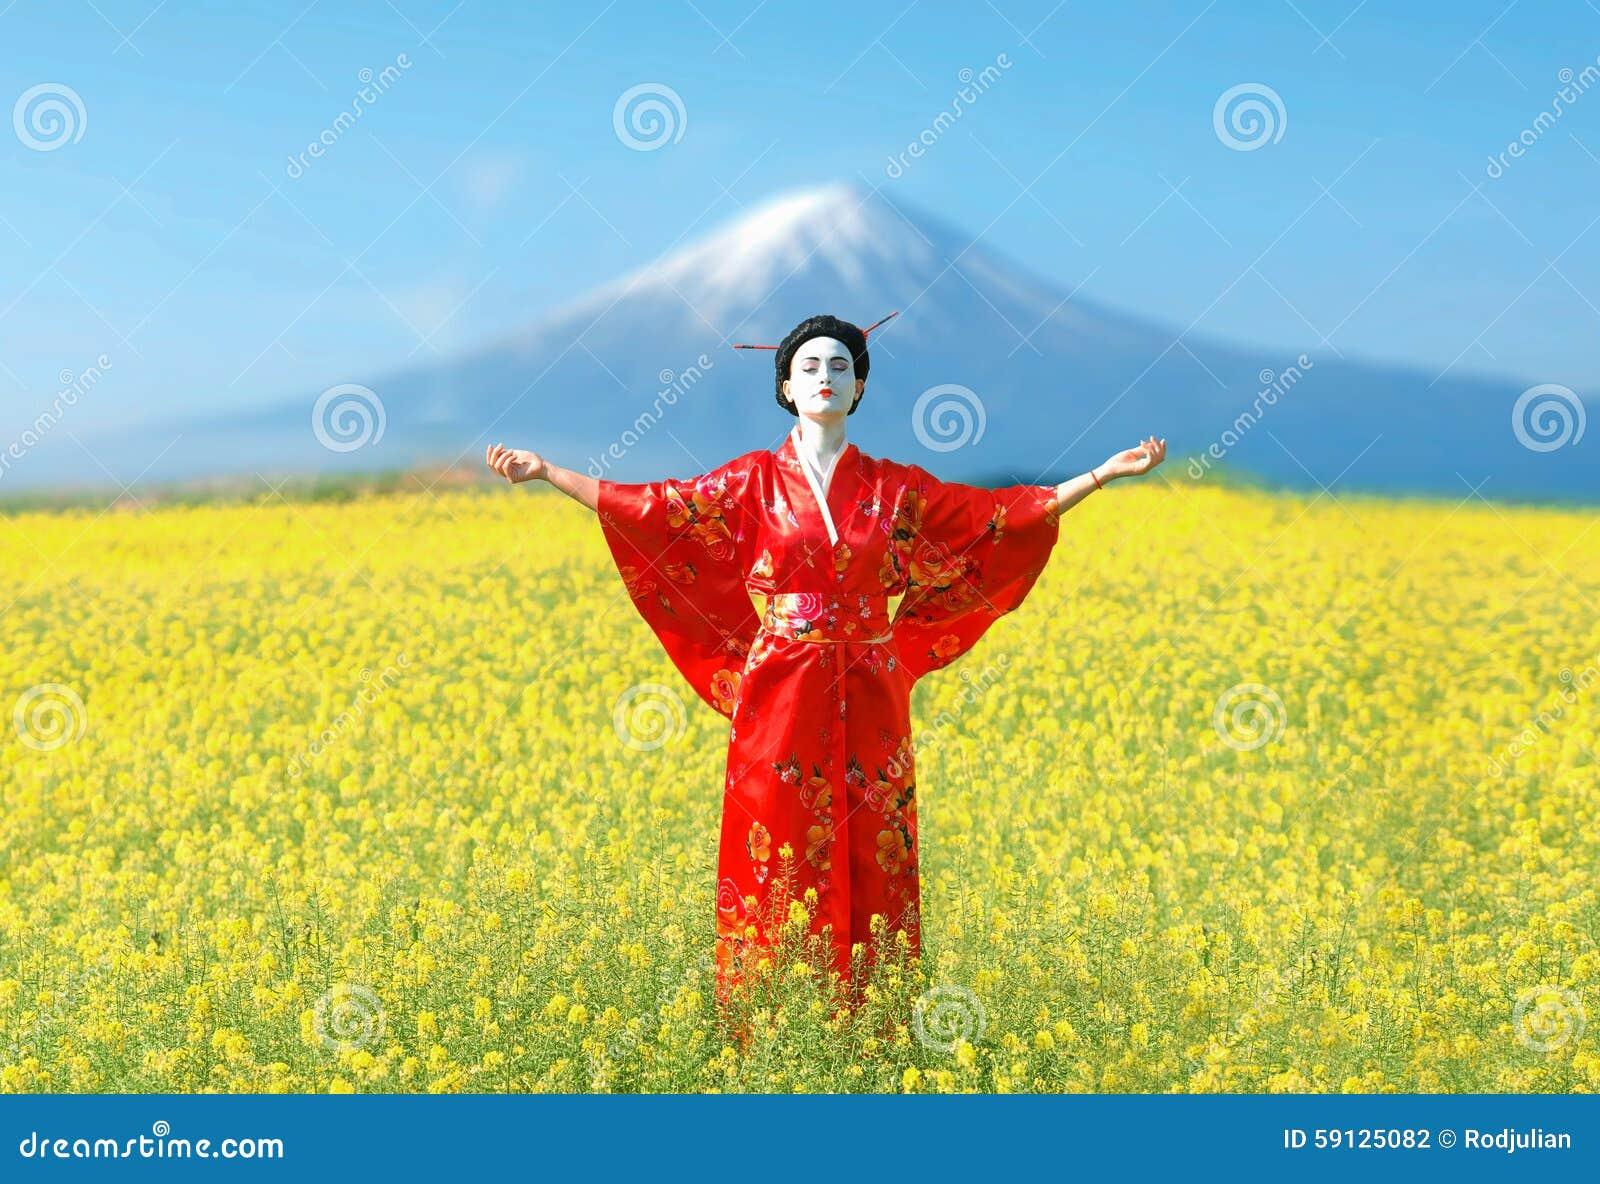 Asian style female portrait